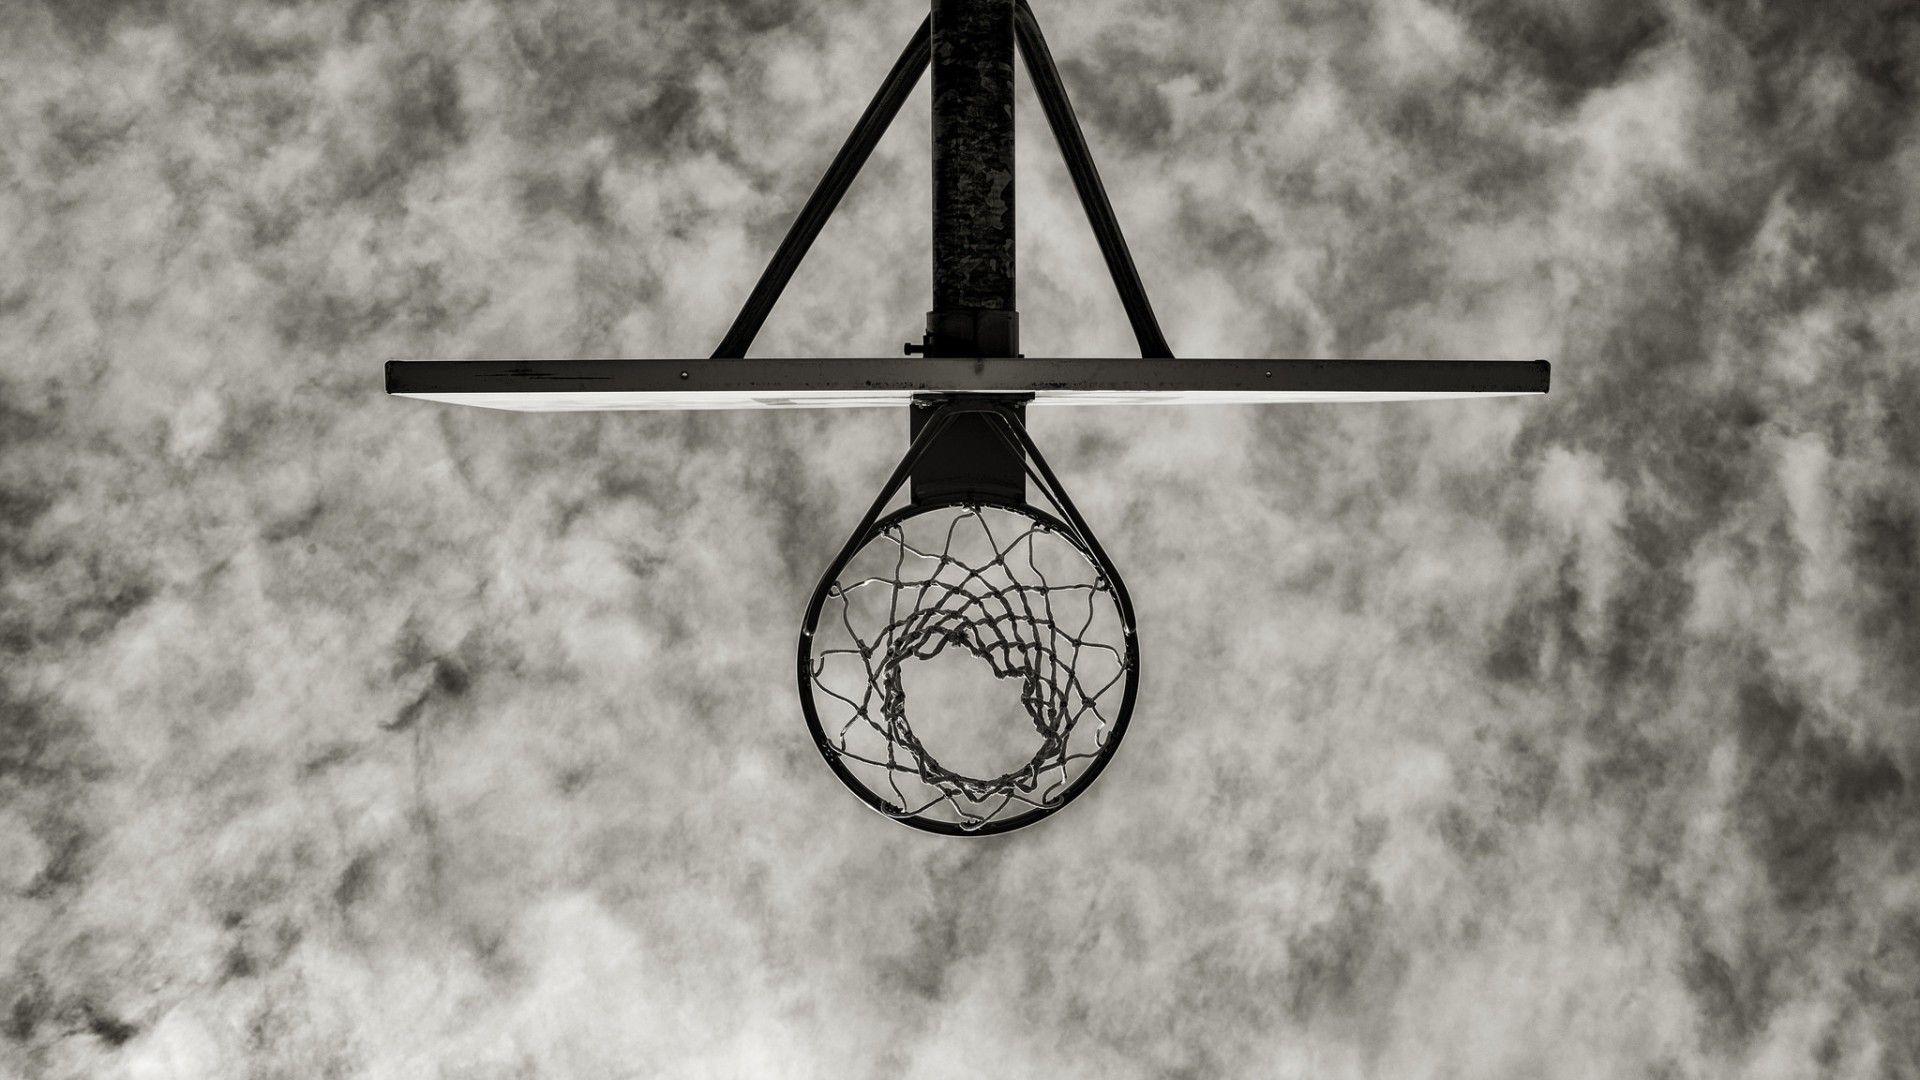 monochrome basketball hoop wallpaper 64223